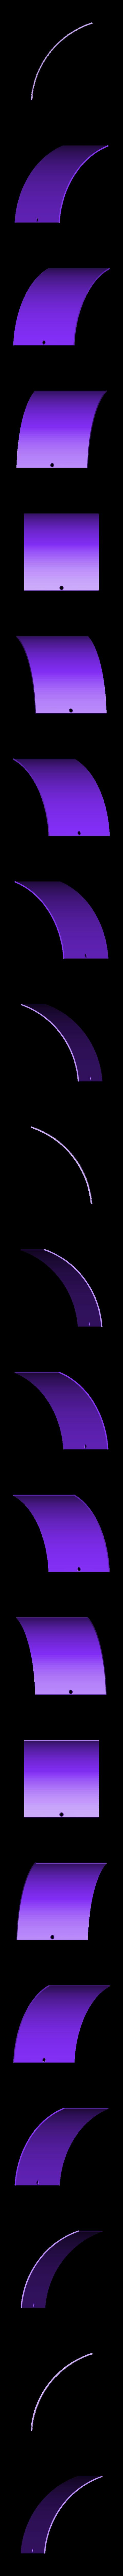 3d-fabric-jean-pierre_strip_hole_part.stl Download STL file Steampunk filament case • 3D printer object, 3d-fabric-jean-pierre